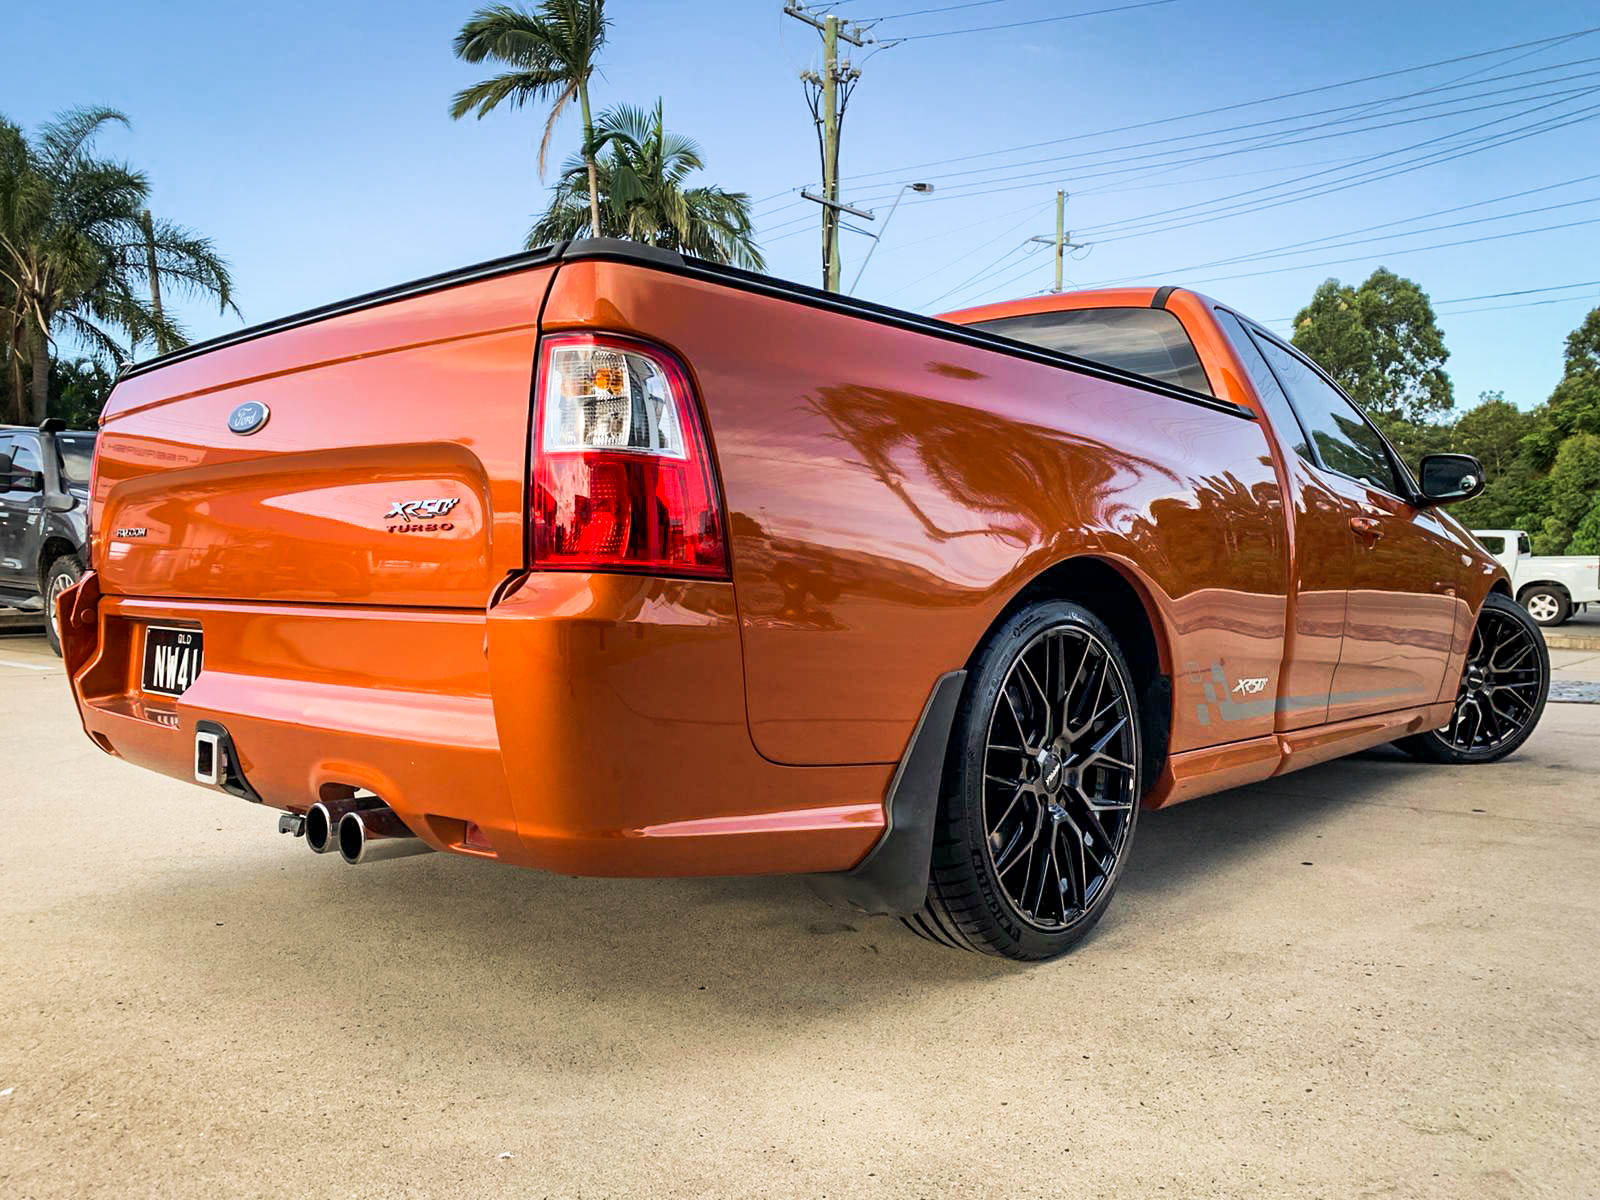 Ford Falcon XR50 on hussla lit Dark tint 3 of 4